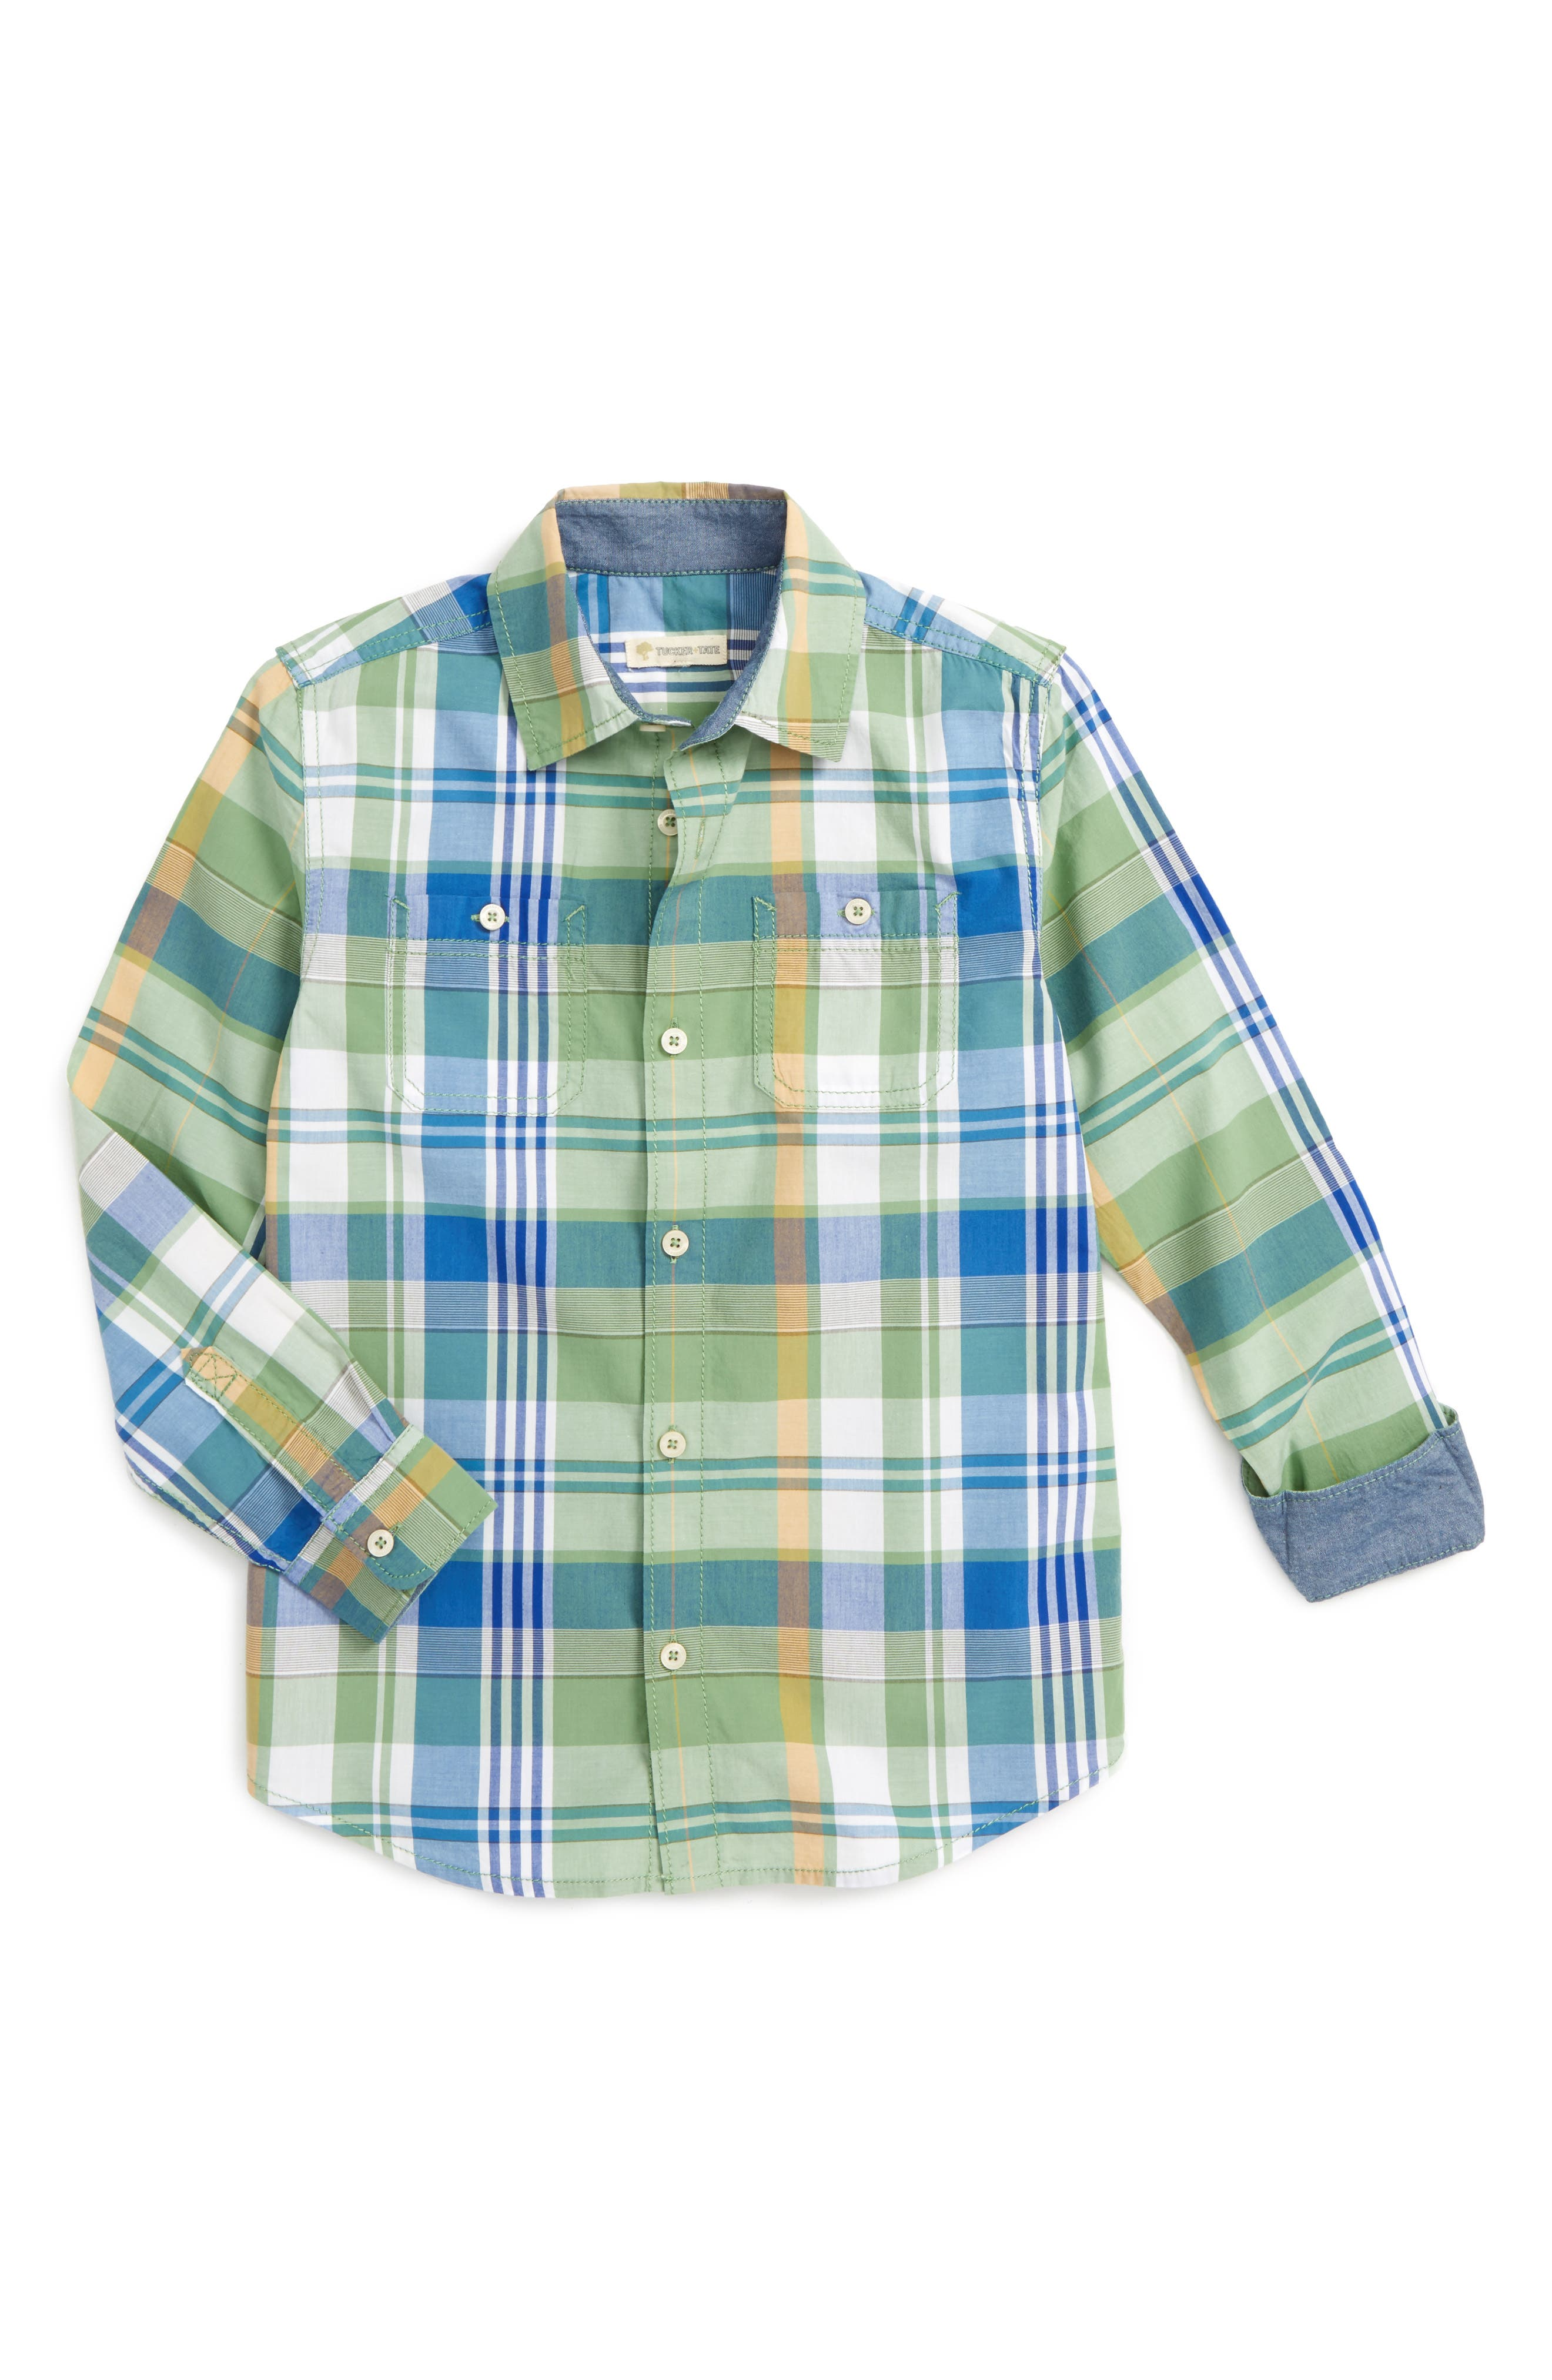 Alternate Image 1 Selected - Tucker + Tate 'Photo' Buffalo Plaid Woven Shirt (Little Boys)